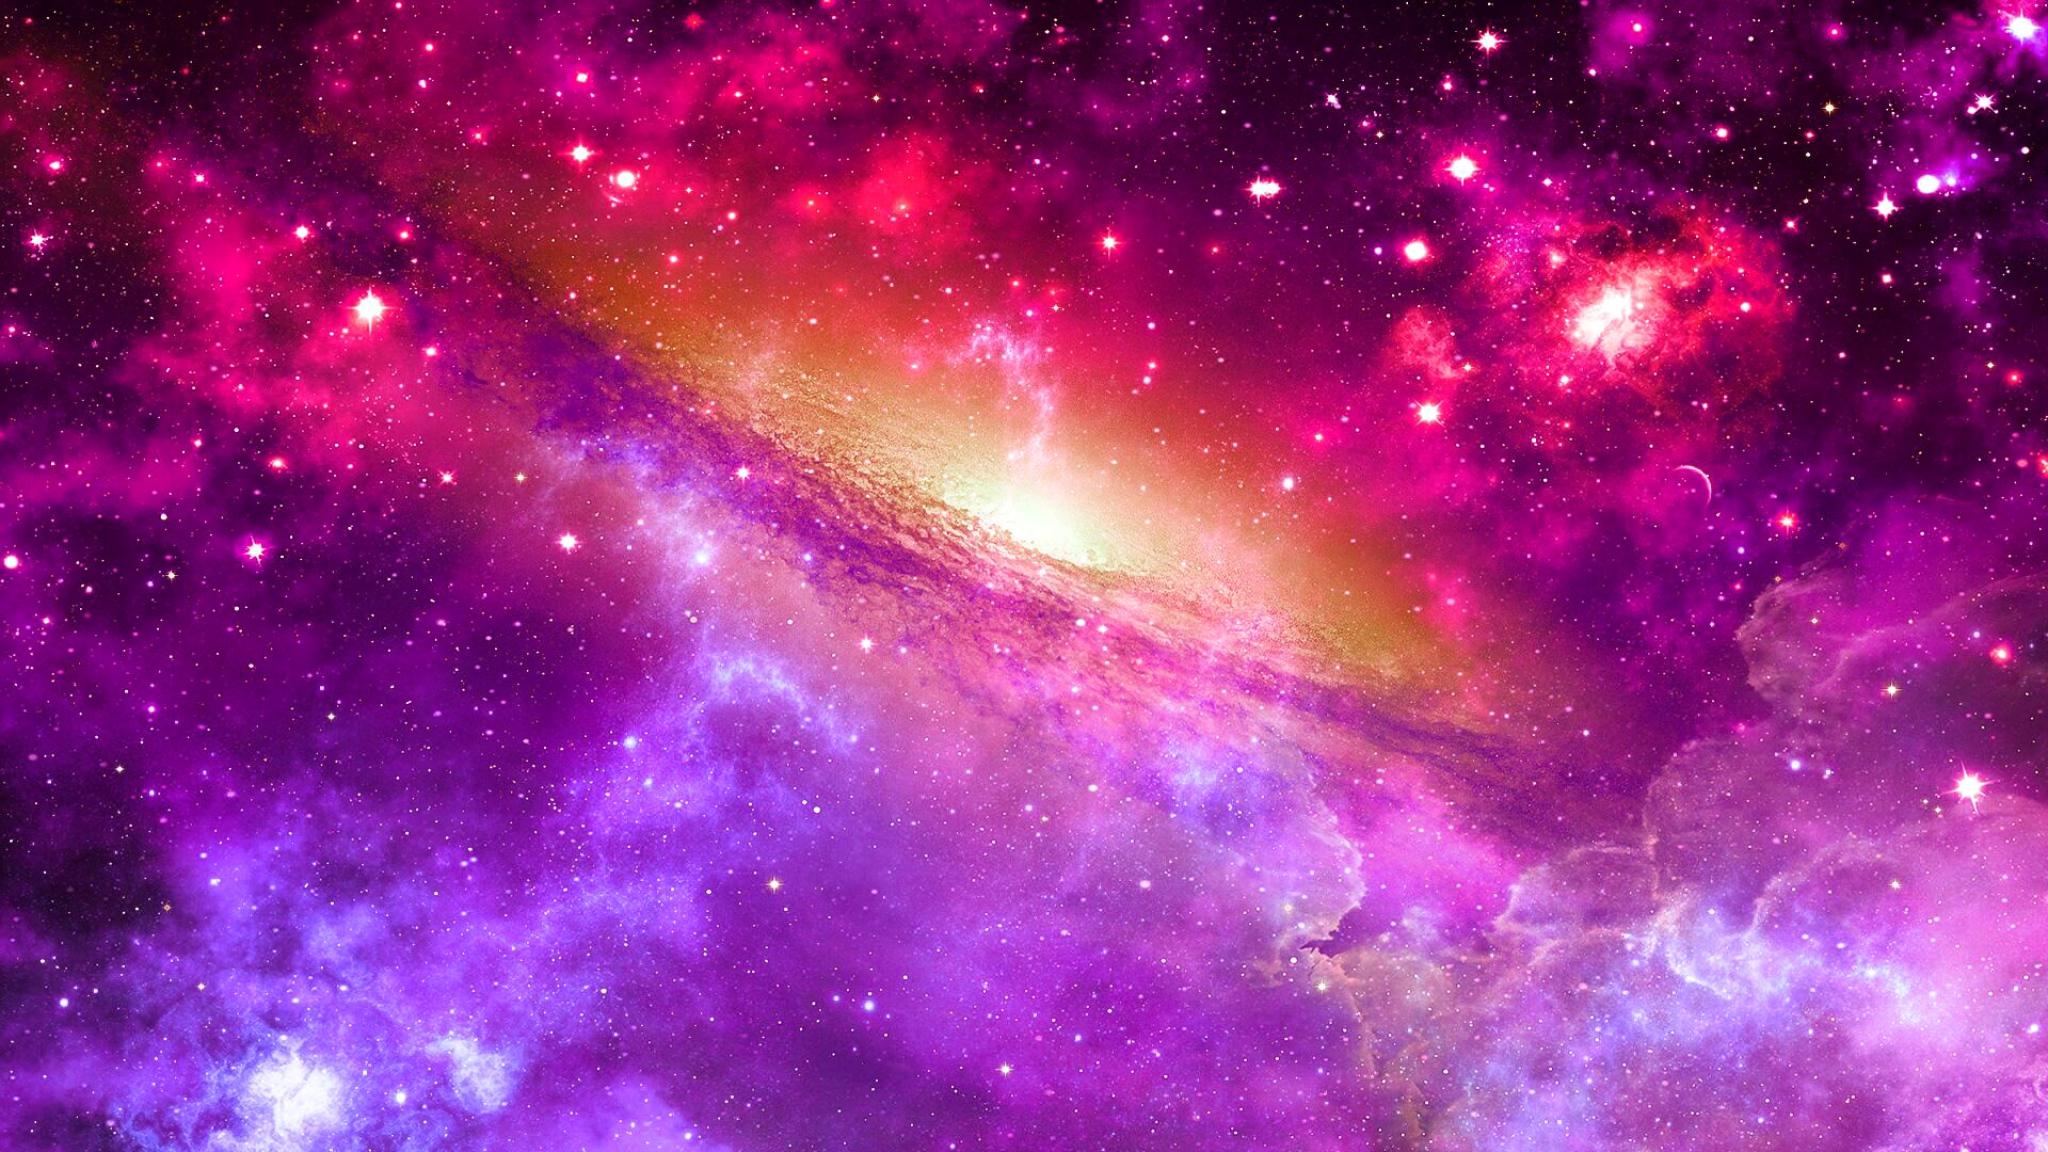 Download Wallpaper 2048x1152 space universe nebula star light HD 2048x1152